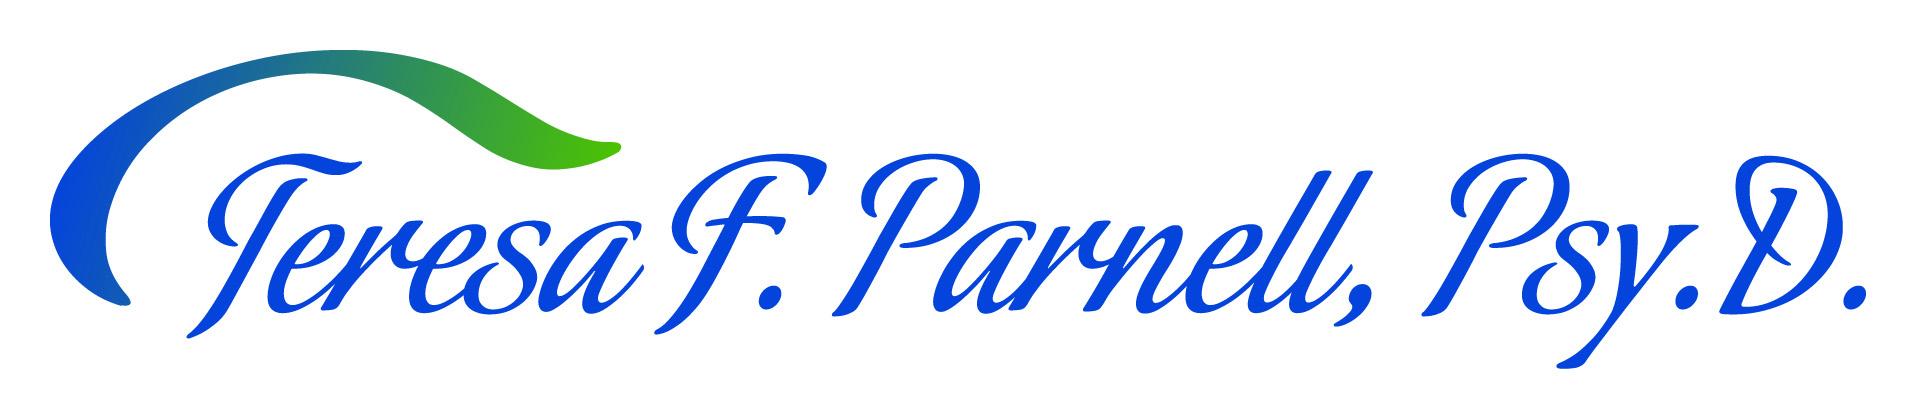 Teresa F. Parnel, Psy.D. Logo